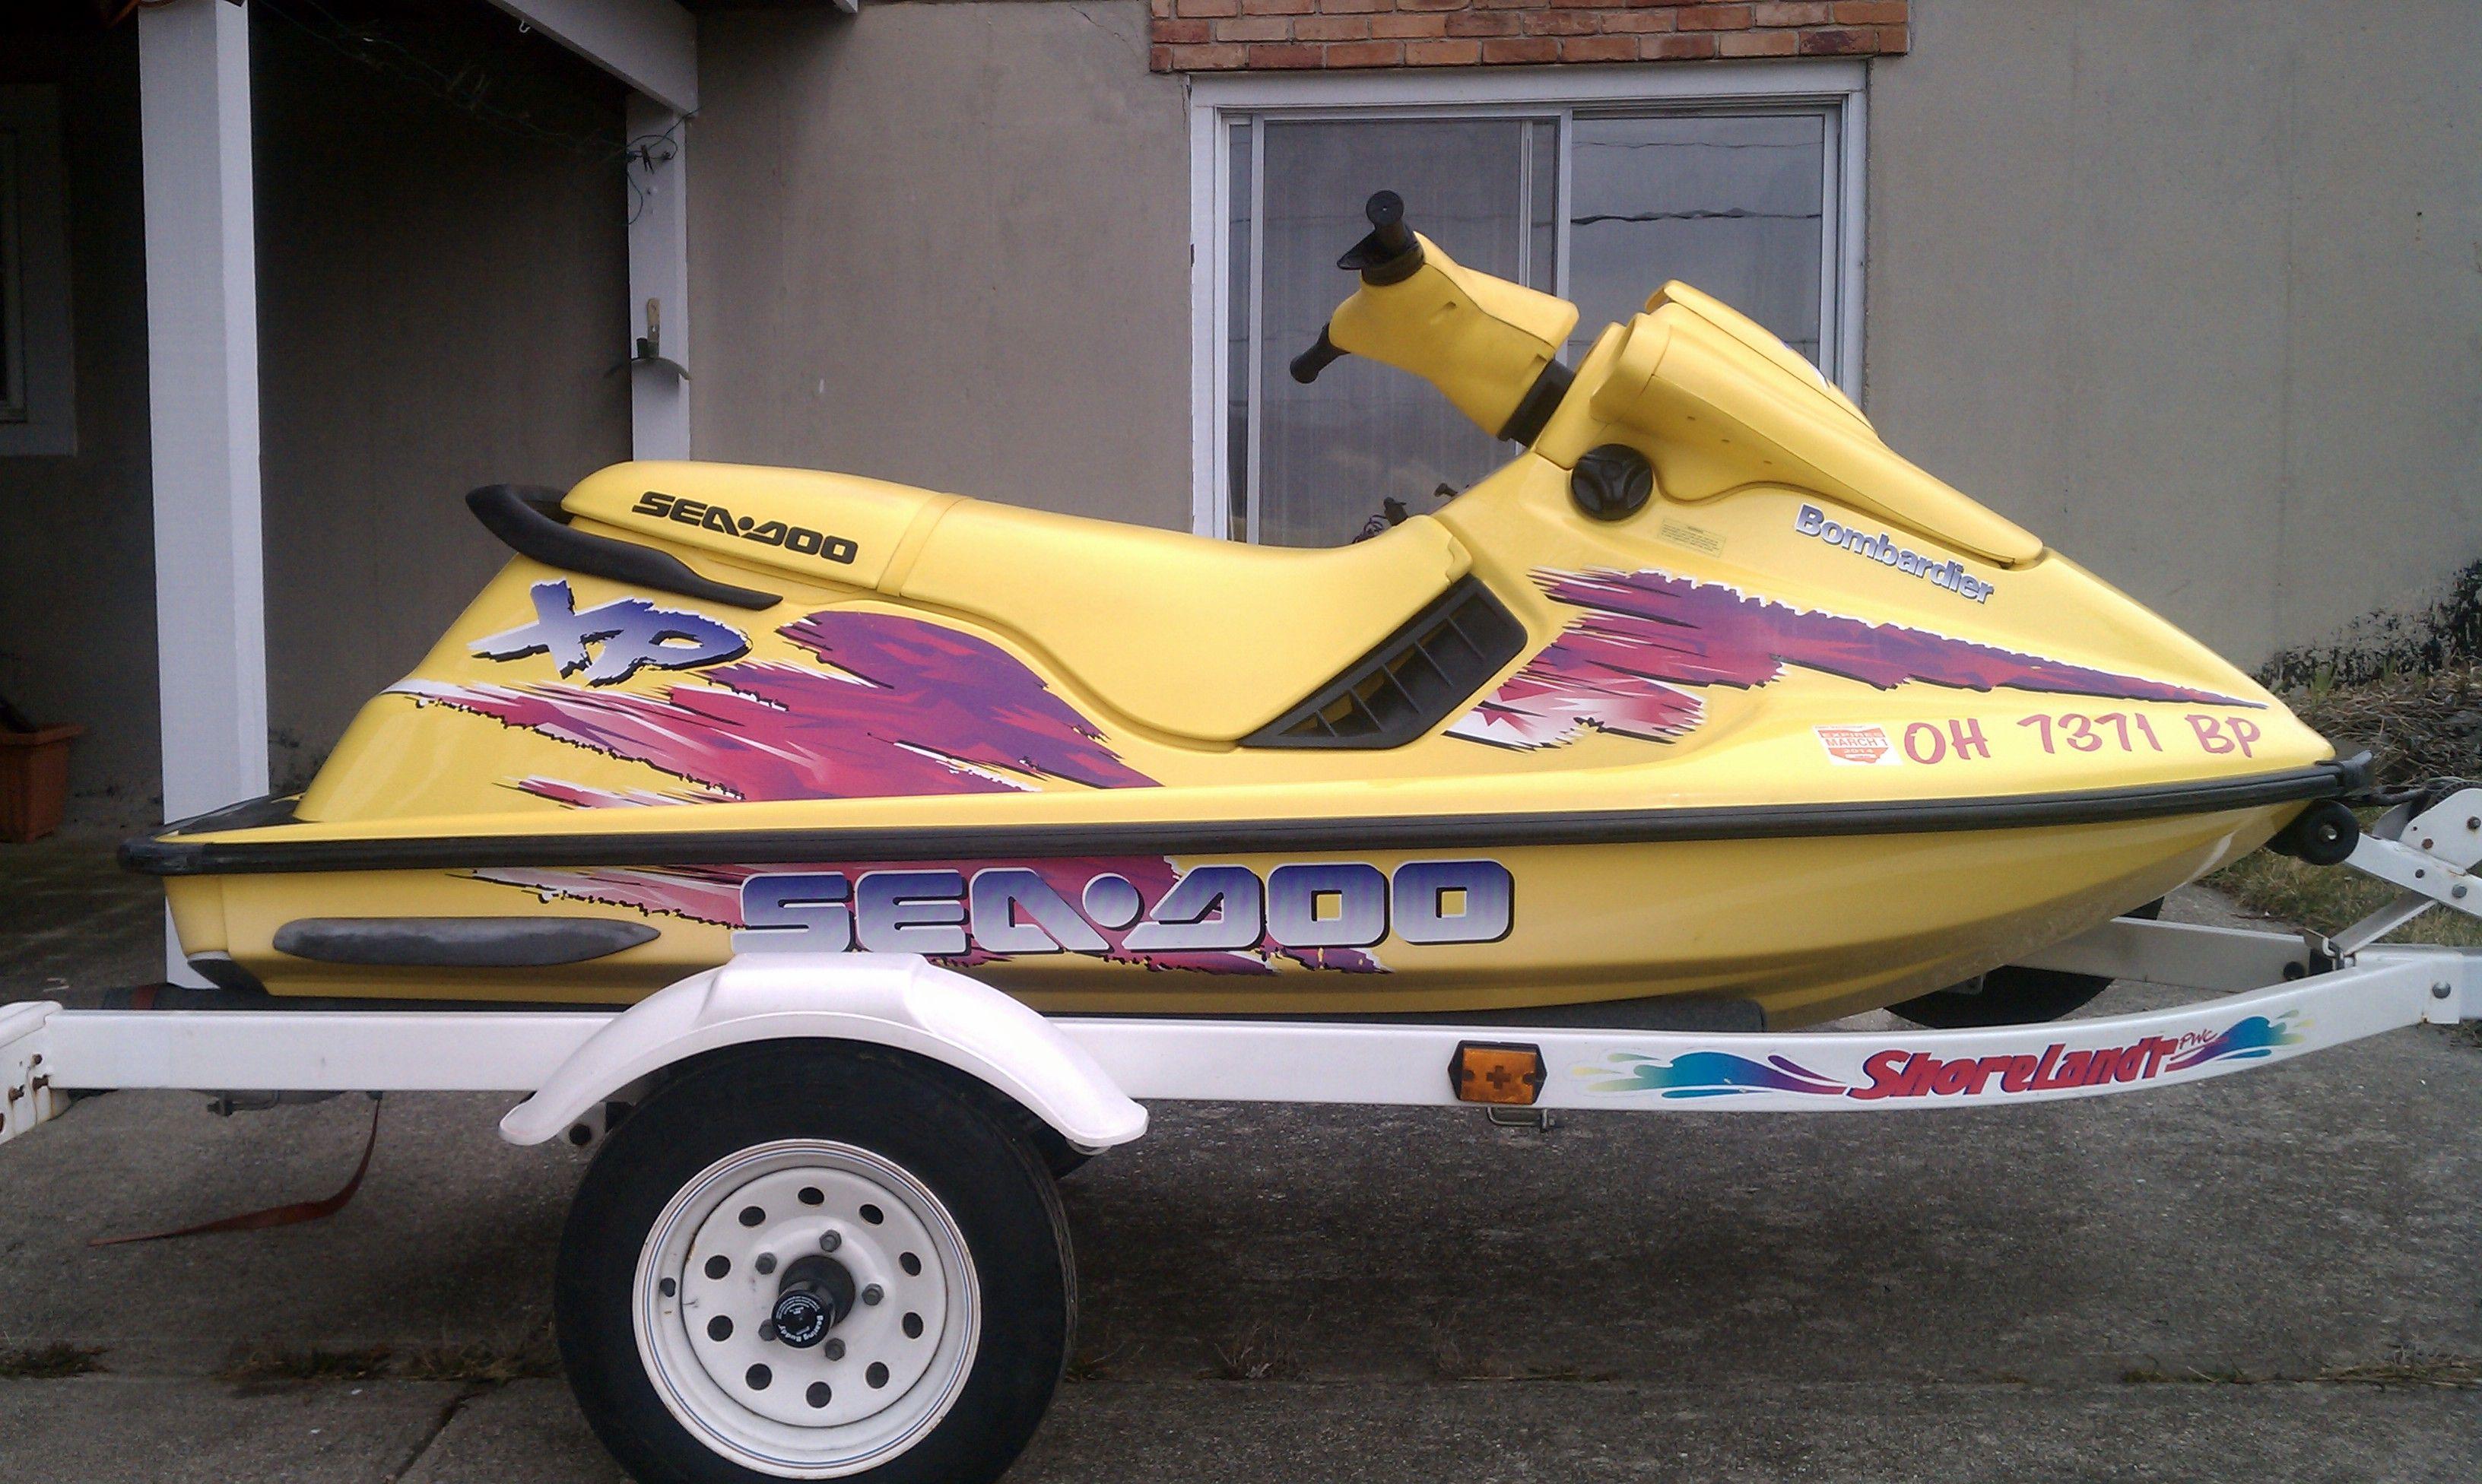 1996 Seadoo Xp >> My First Watercraft 1996 Seadoo Xp Cars Trucks And Boats Water